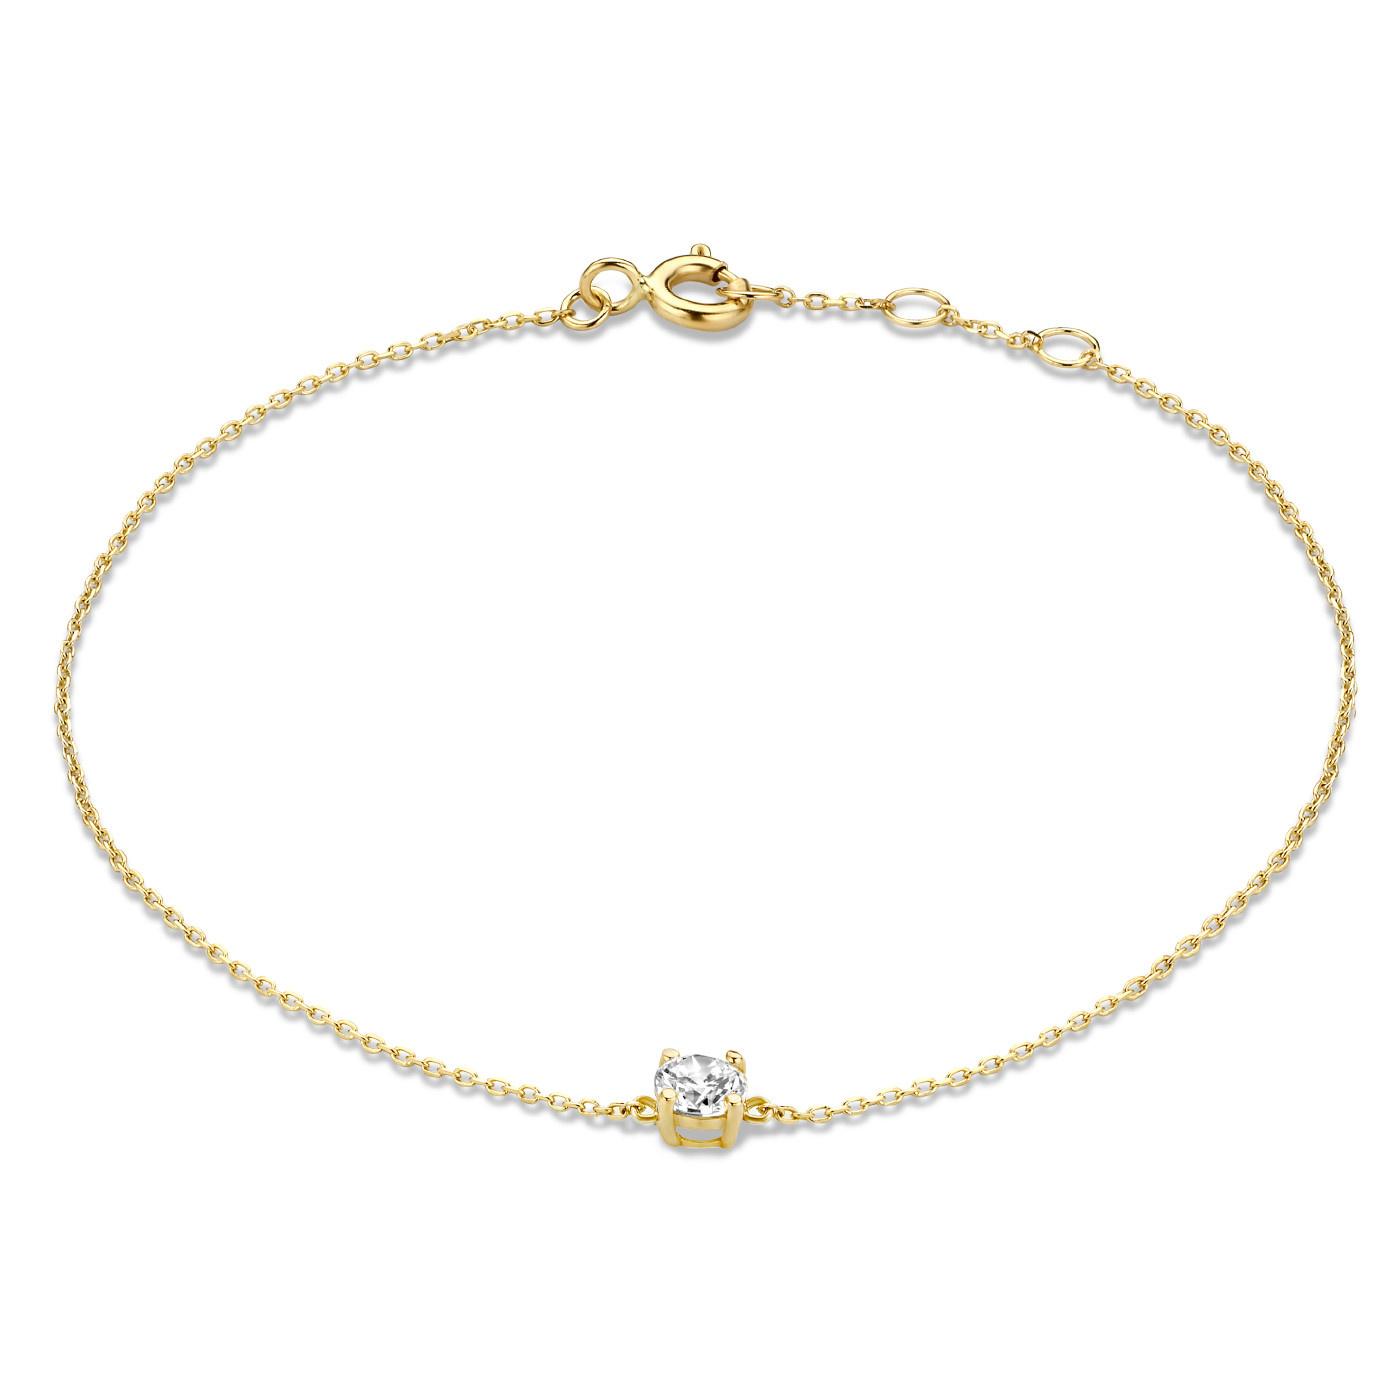 Isabel Bernard Le Marais Isabeau bracelet en or 14 carats